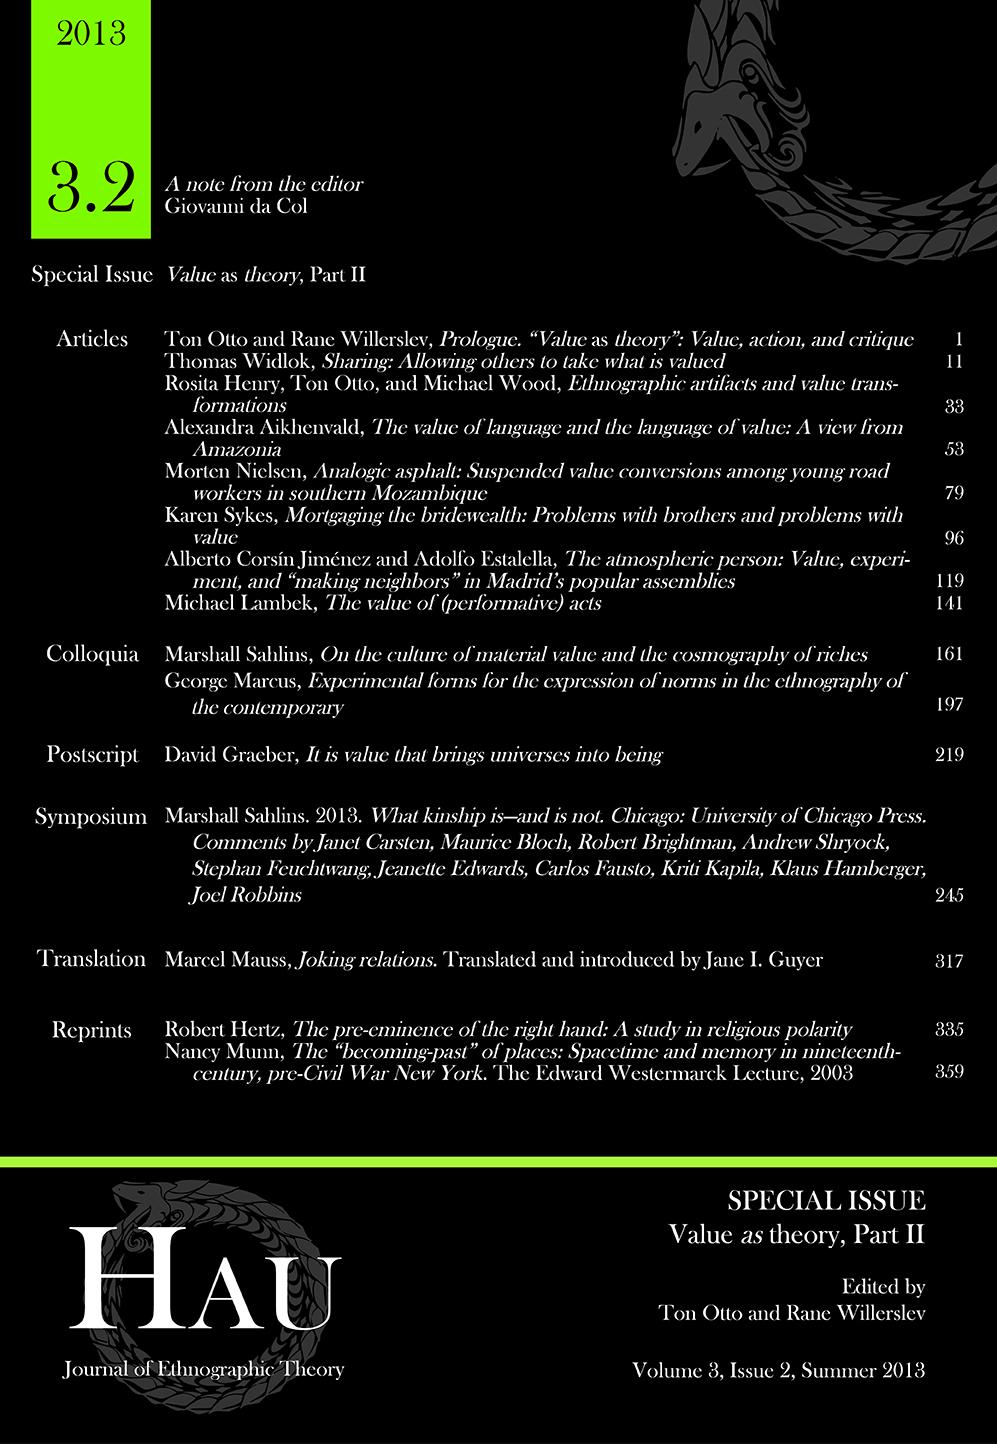 HAU Vol 3.2